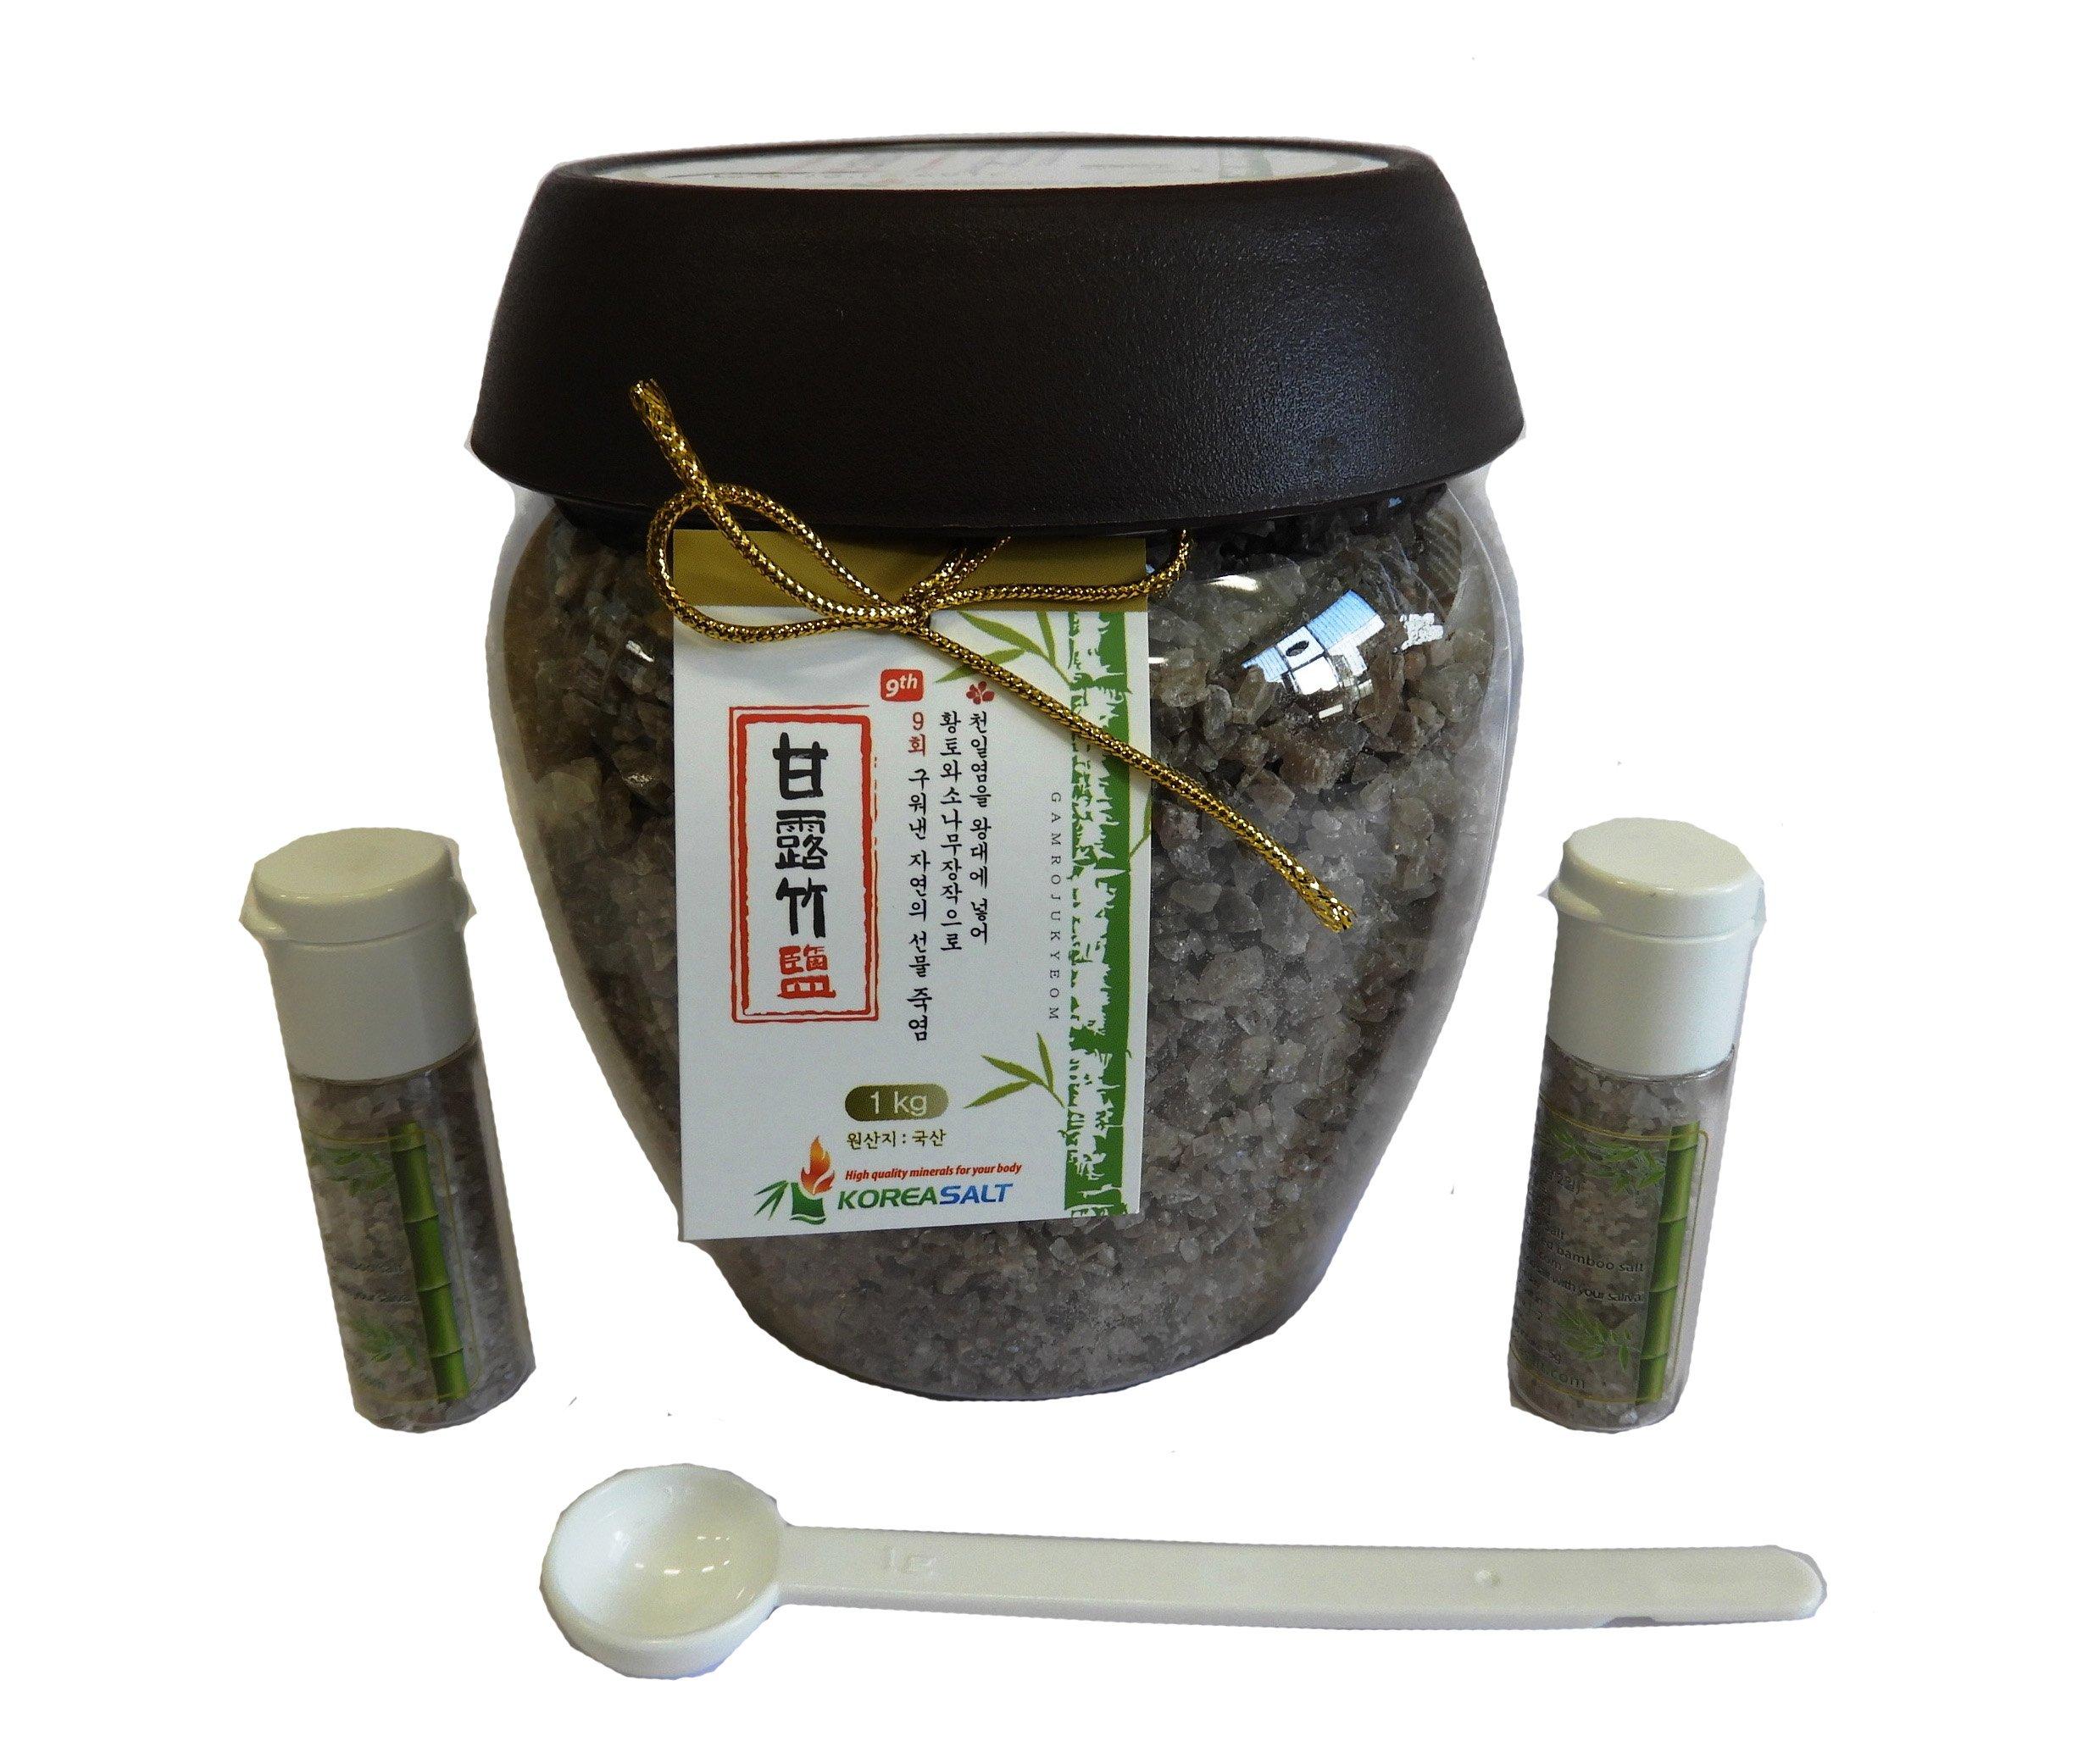 Original Korea Bamboo Salt Crystal 9-Times Roasted 1 Kg (2.2 lbs) Rich Minerals